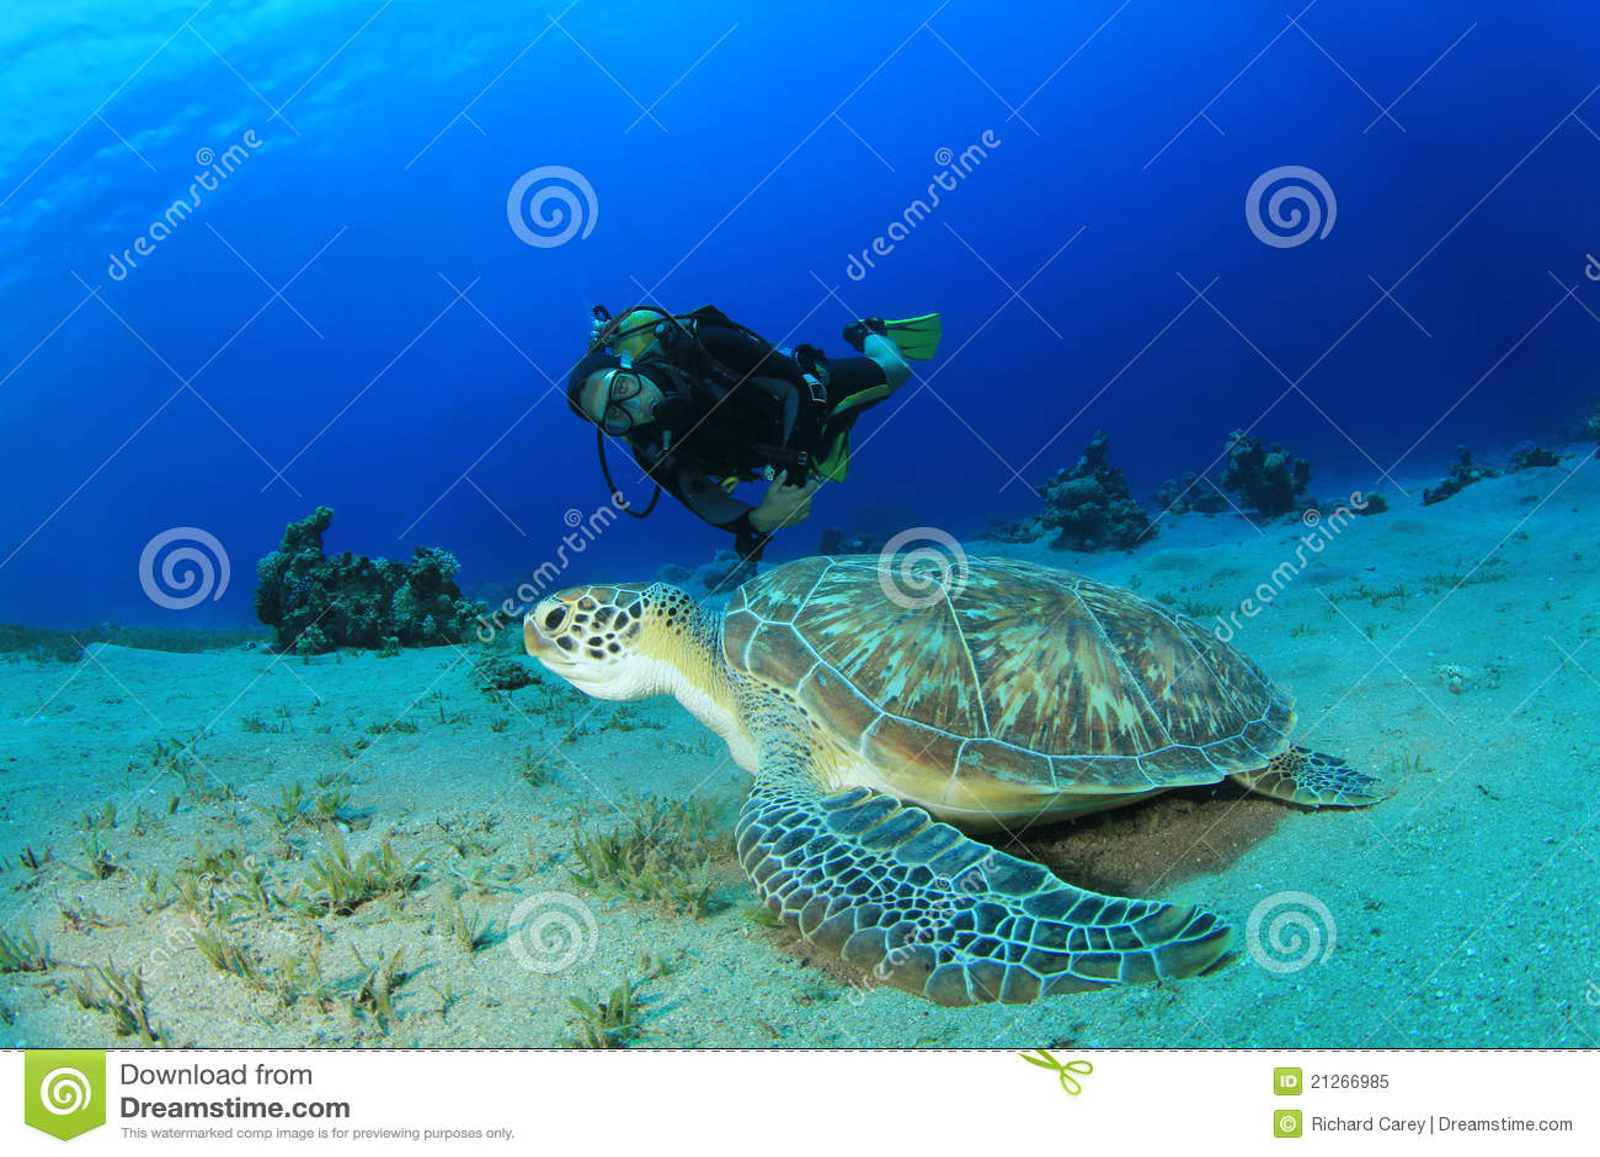 Scuba Diver and Green Turtle